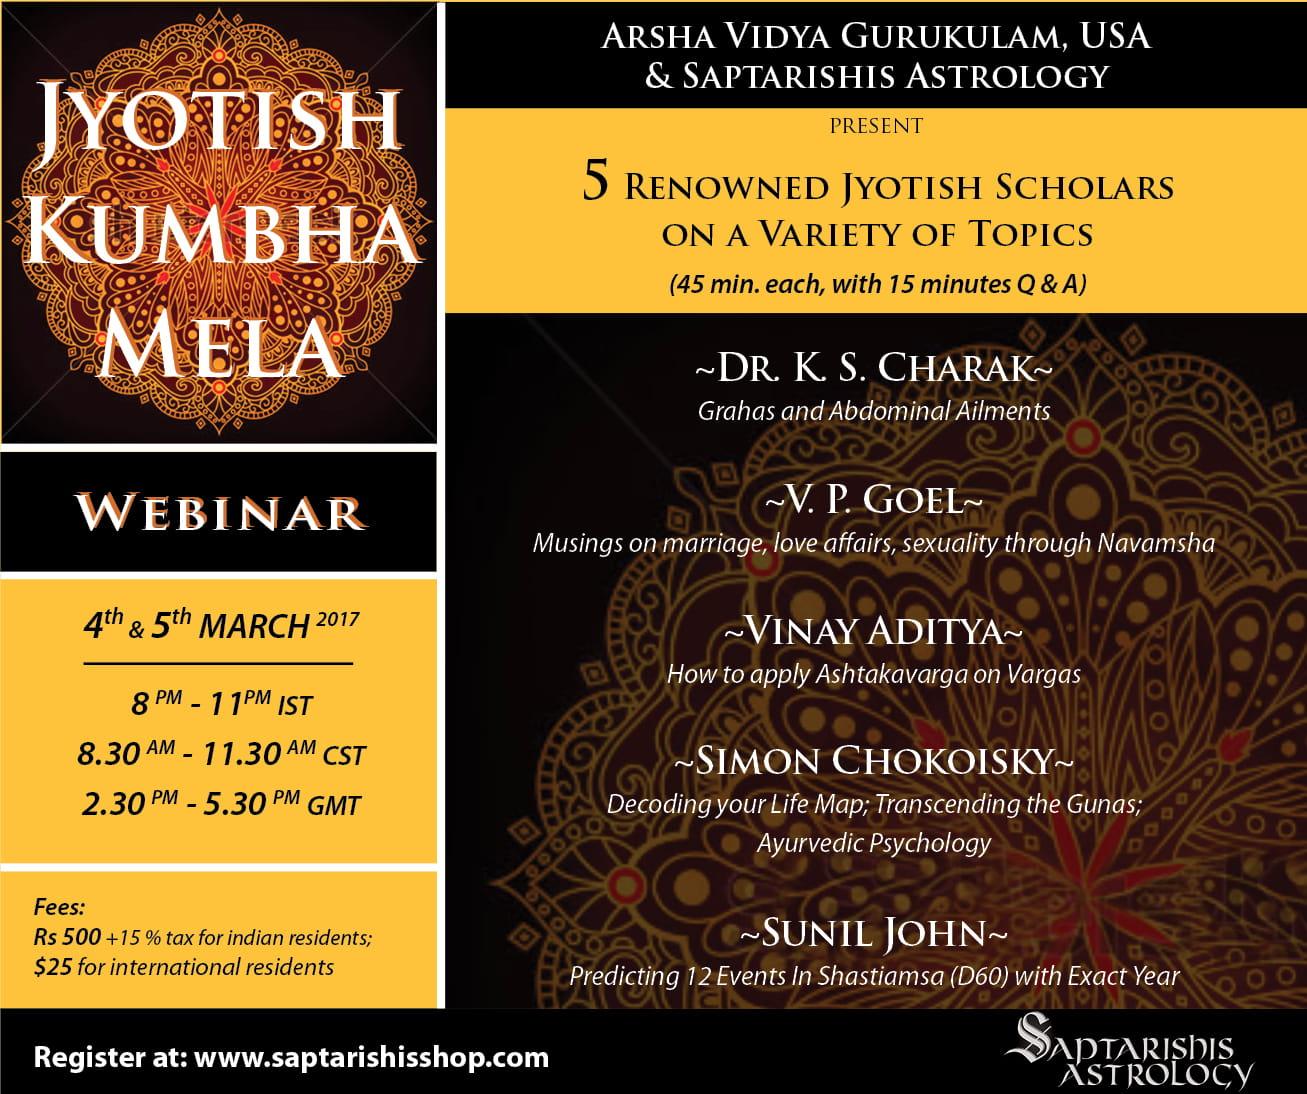 Webinar Recordings: Jyotish Kumbha Mela Held On 4th and 5th March [SA]